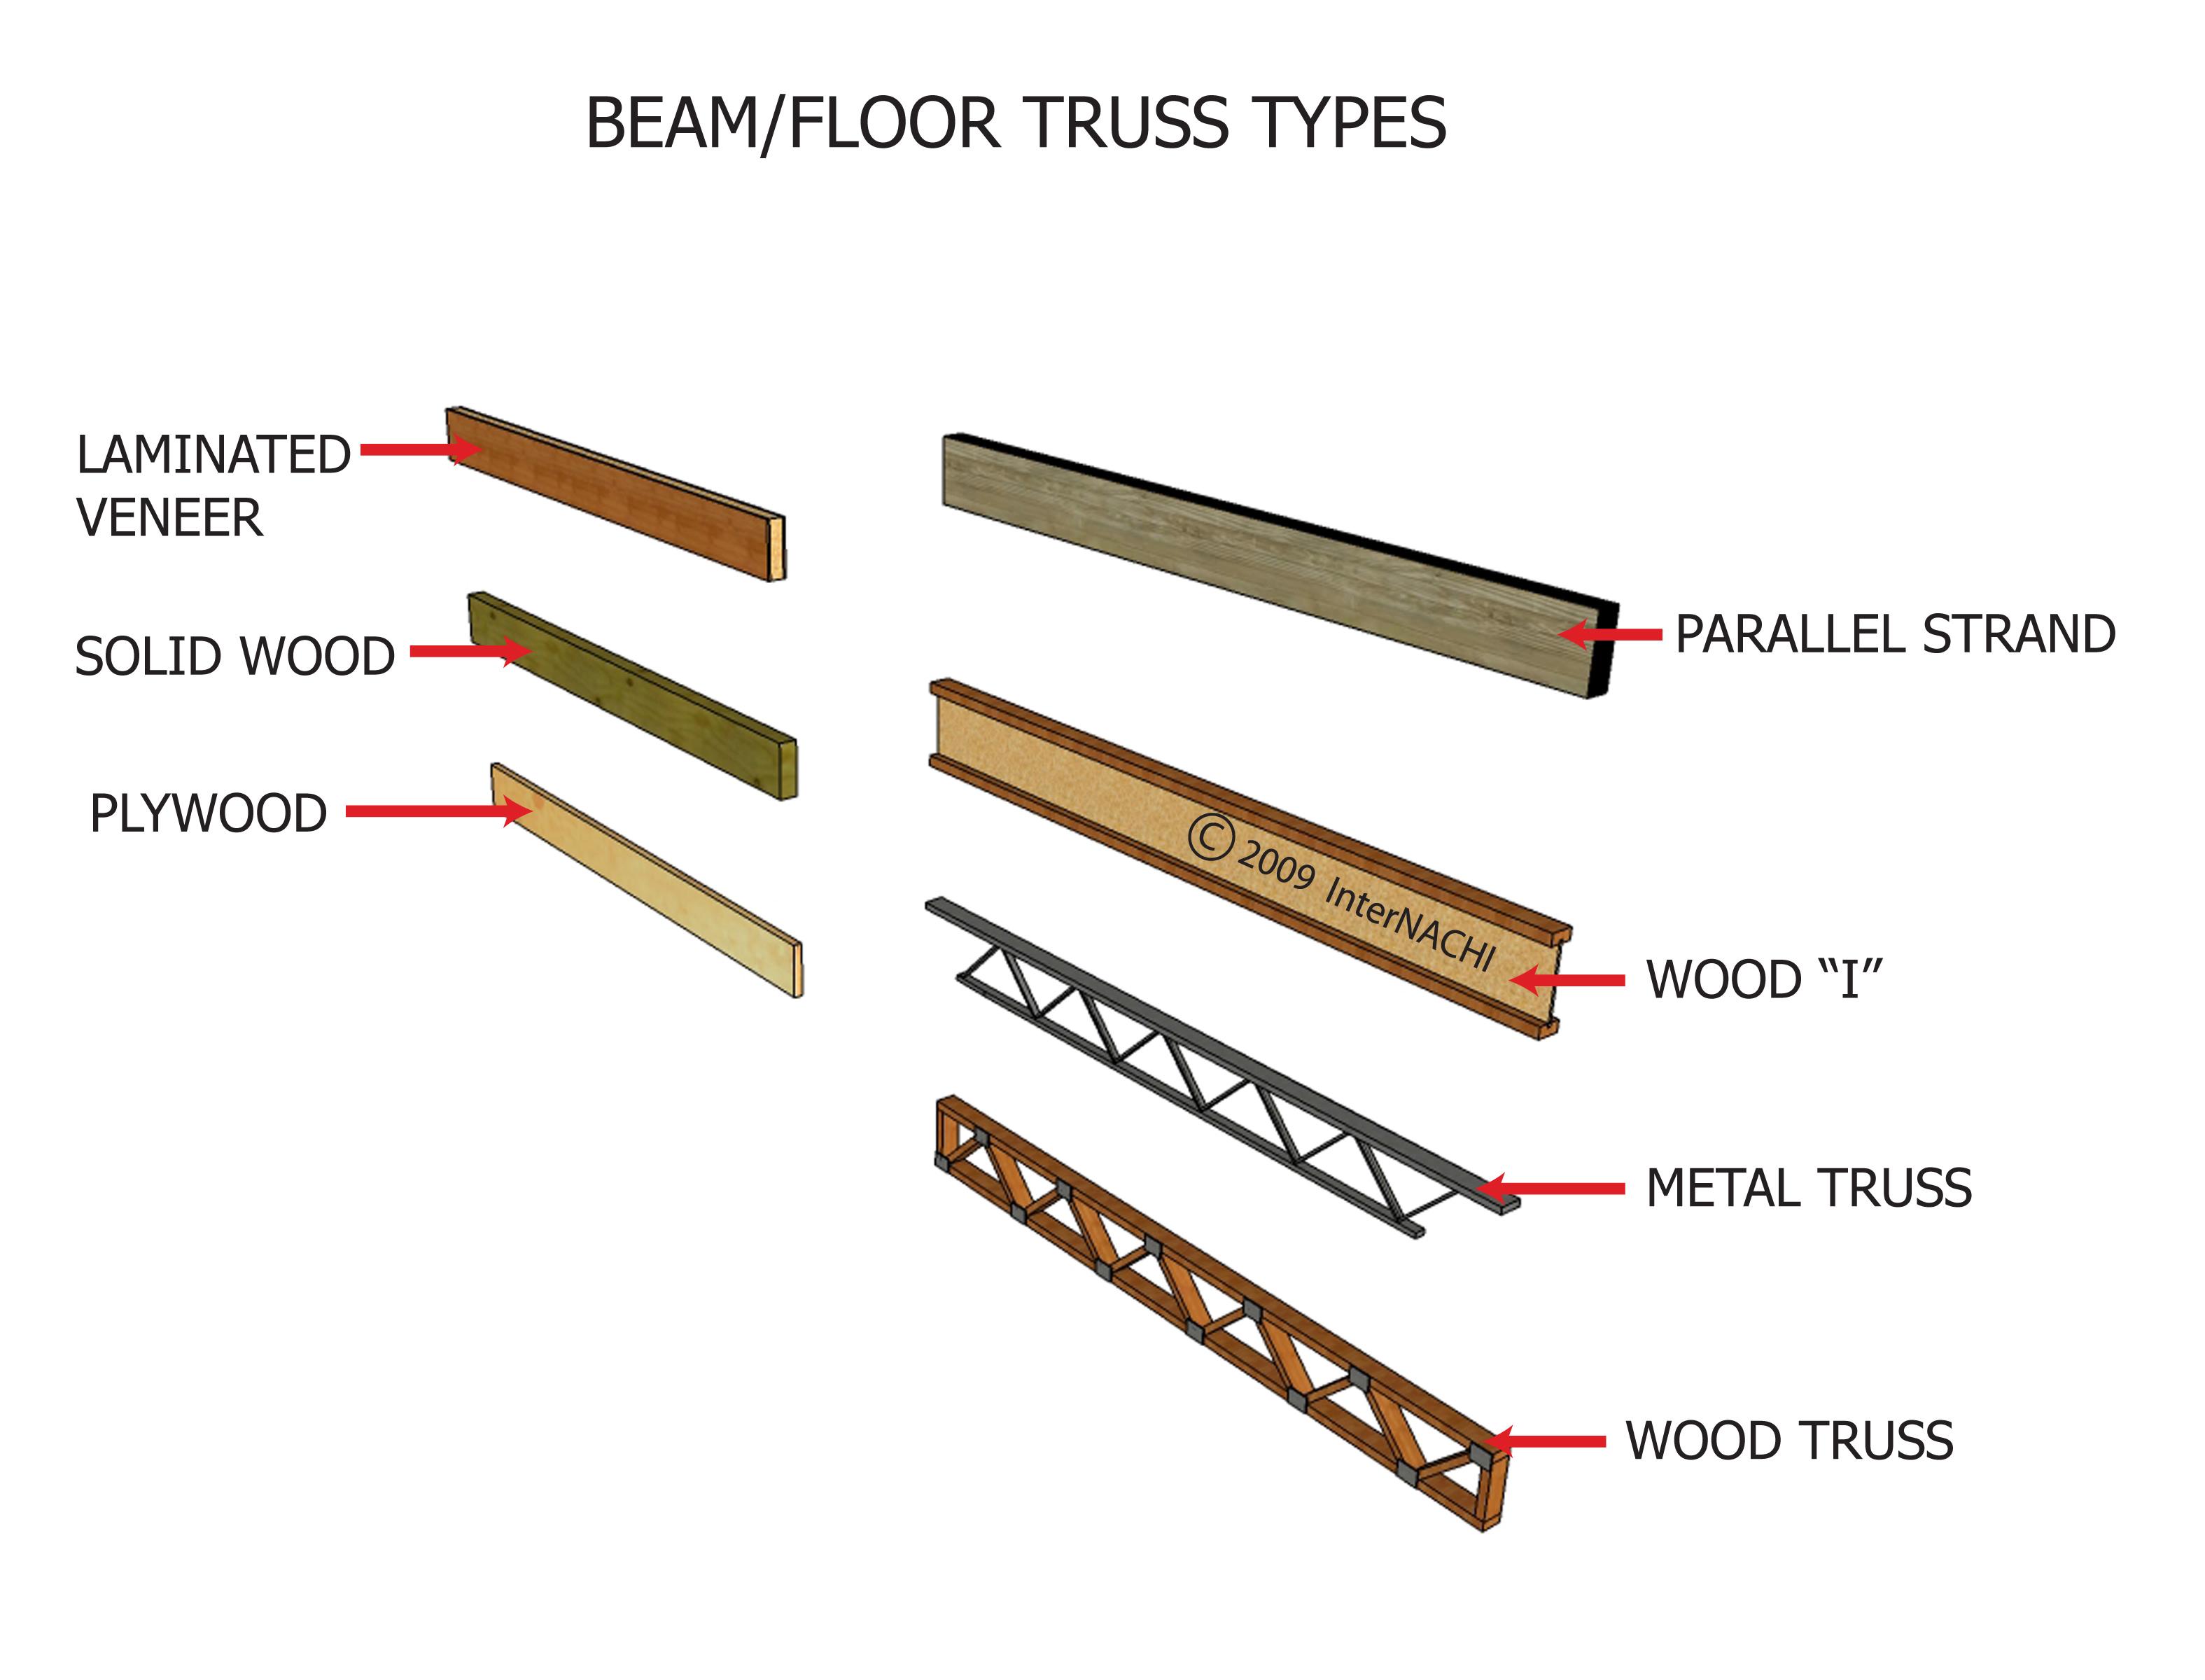 Beam/floor truss types.